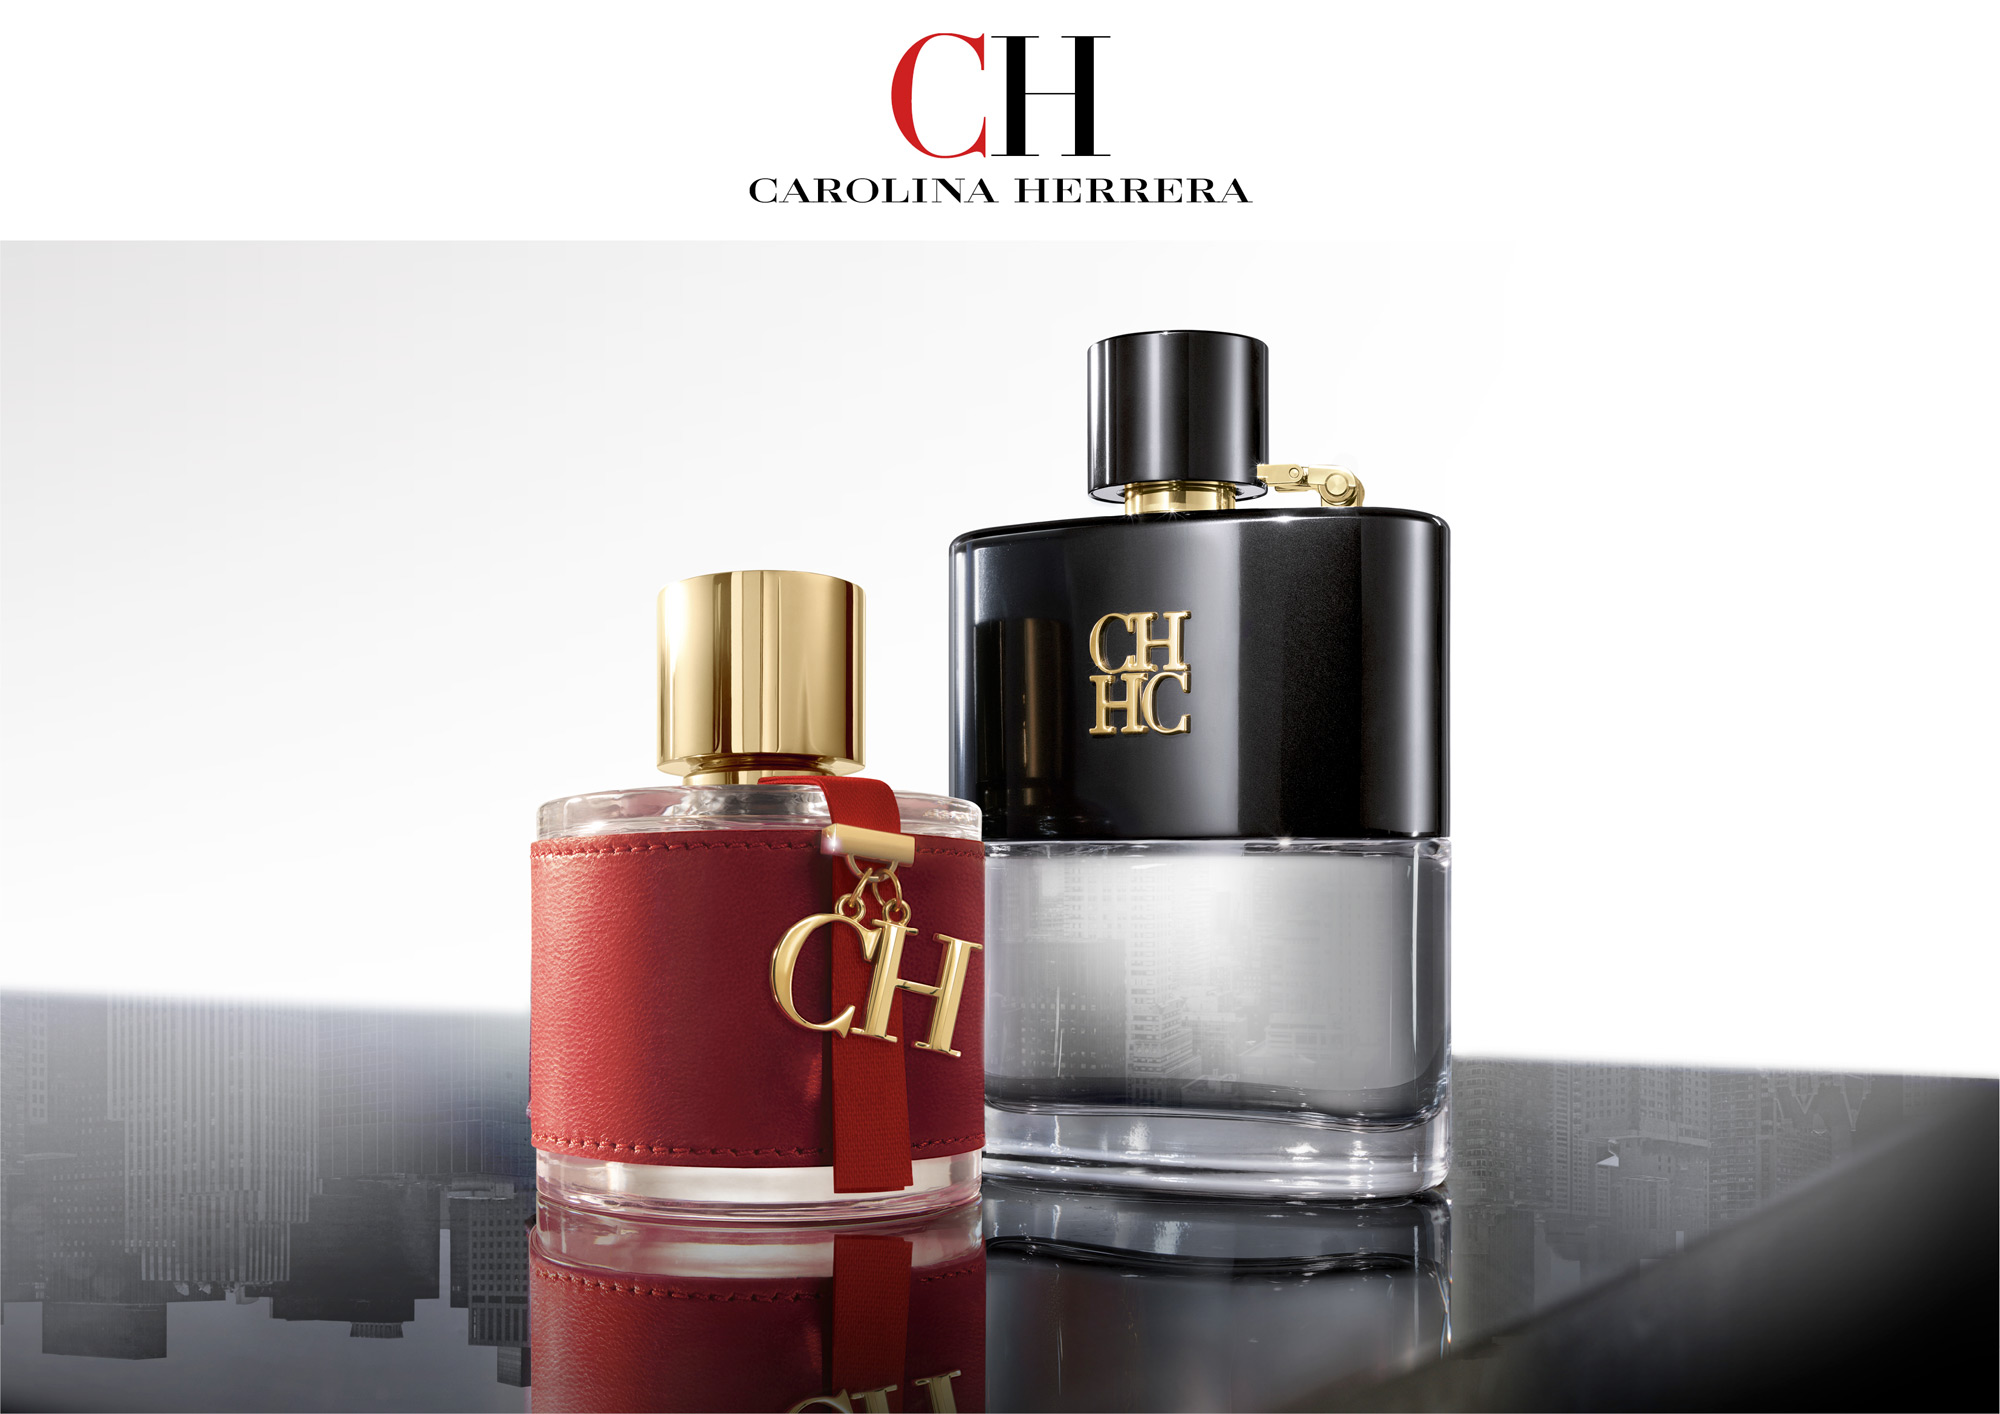 d79a7e77a CH (2015) Carolina Herrera perfume - a fragrance for women 2015